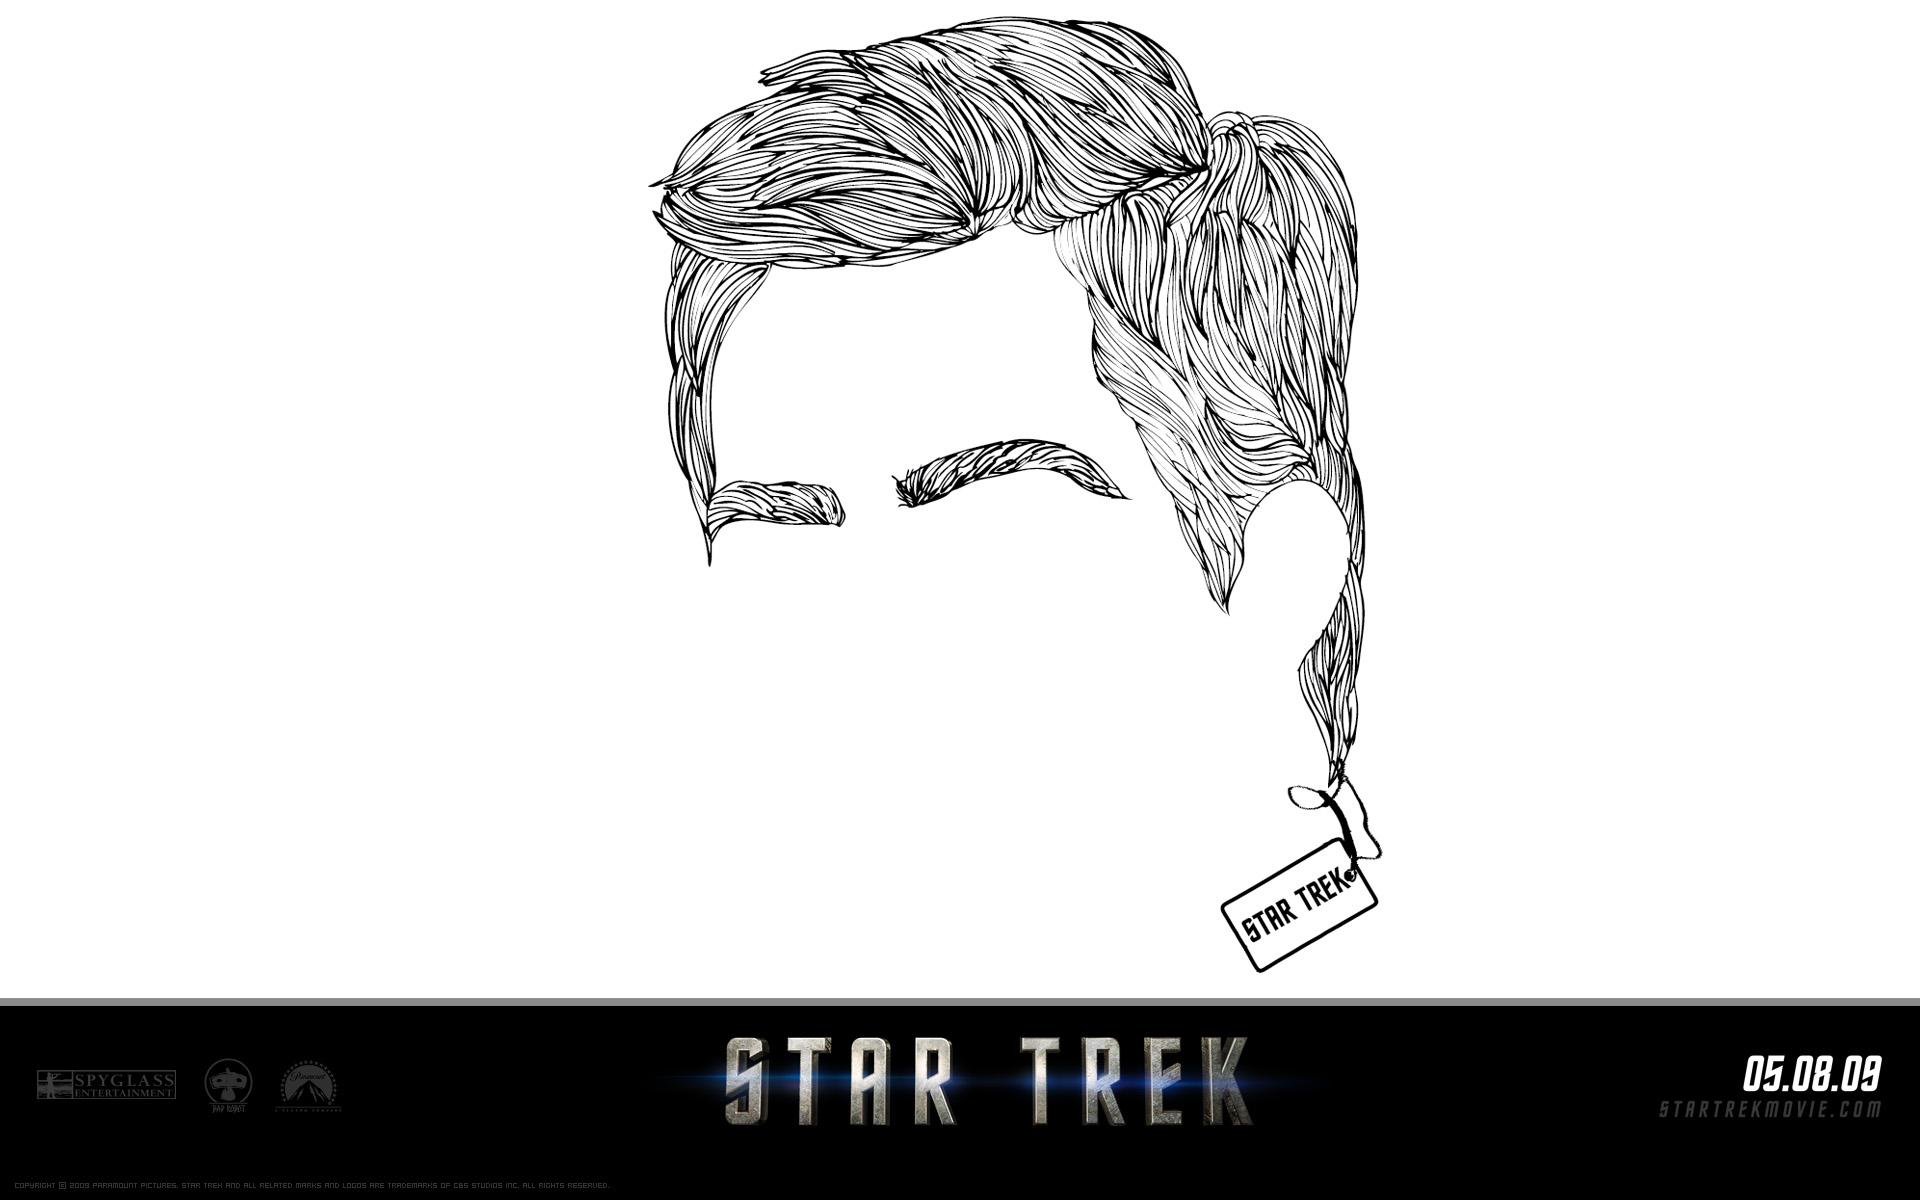 Exclusives Star Trek Dac Poster Star Trek Movie Desktop